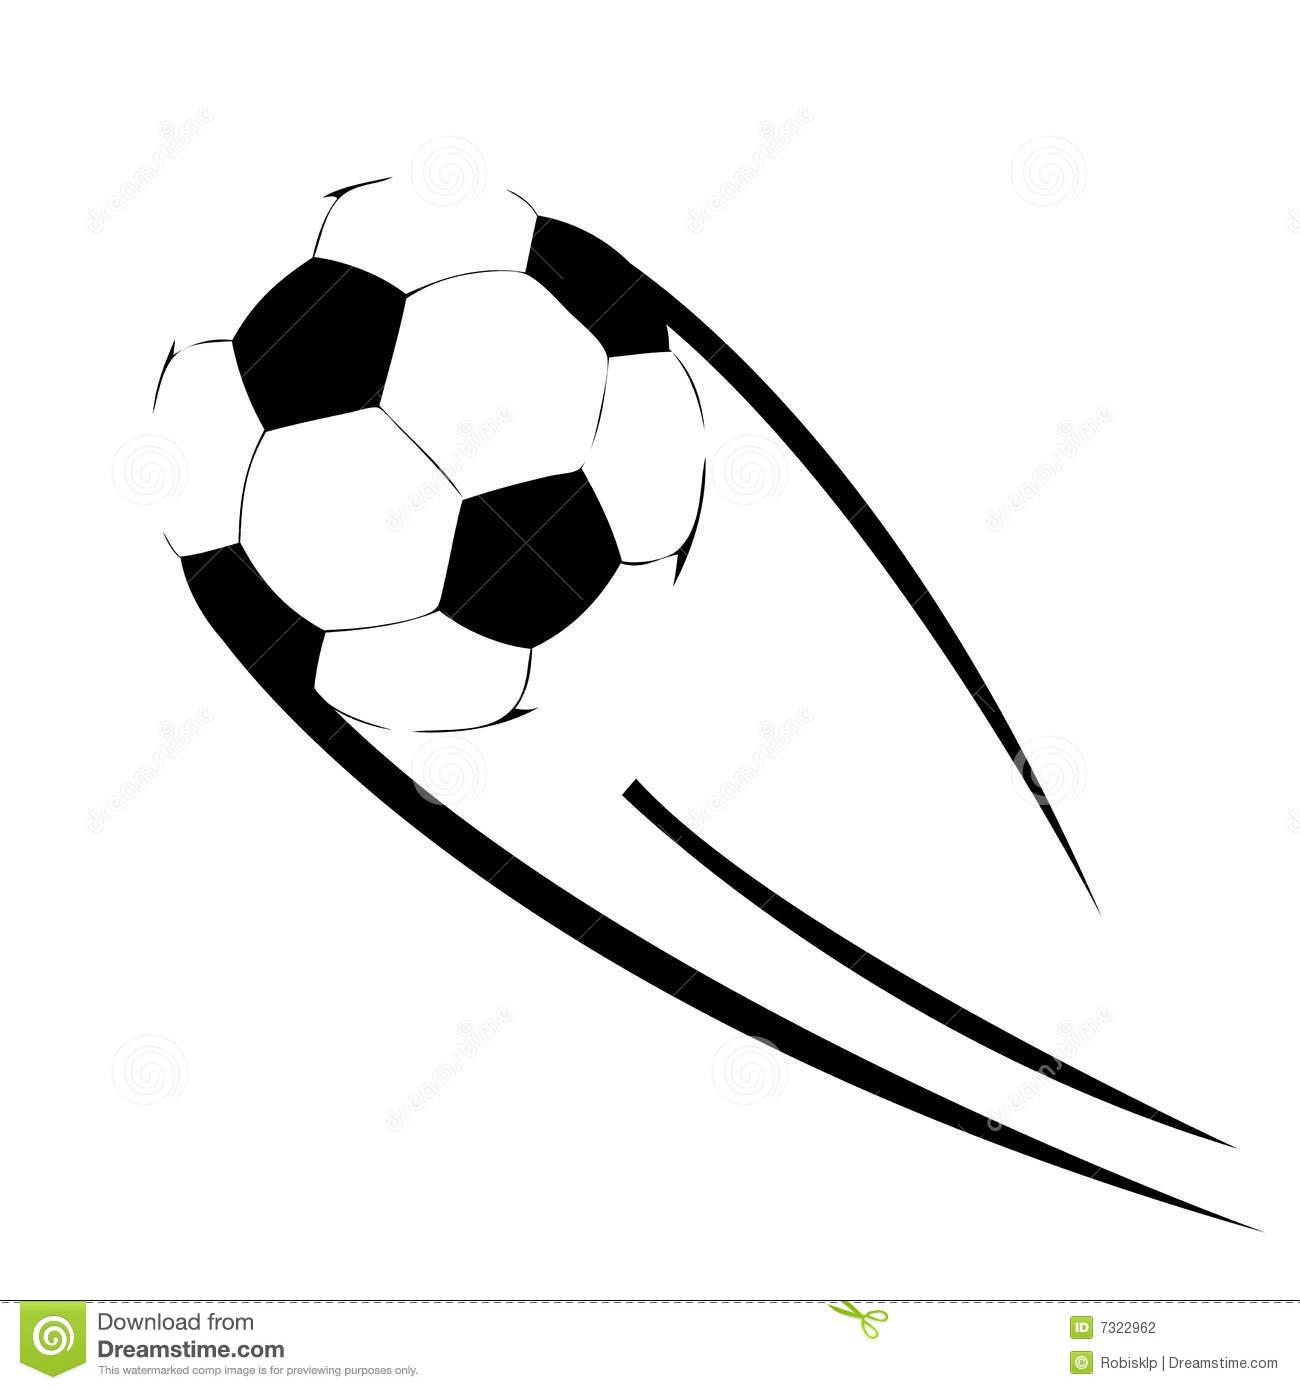 Half soccer ball clipart image Soccer ball clip art download - ClipartFest image